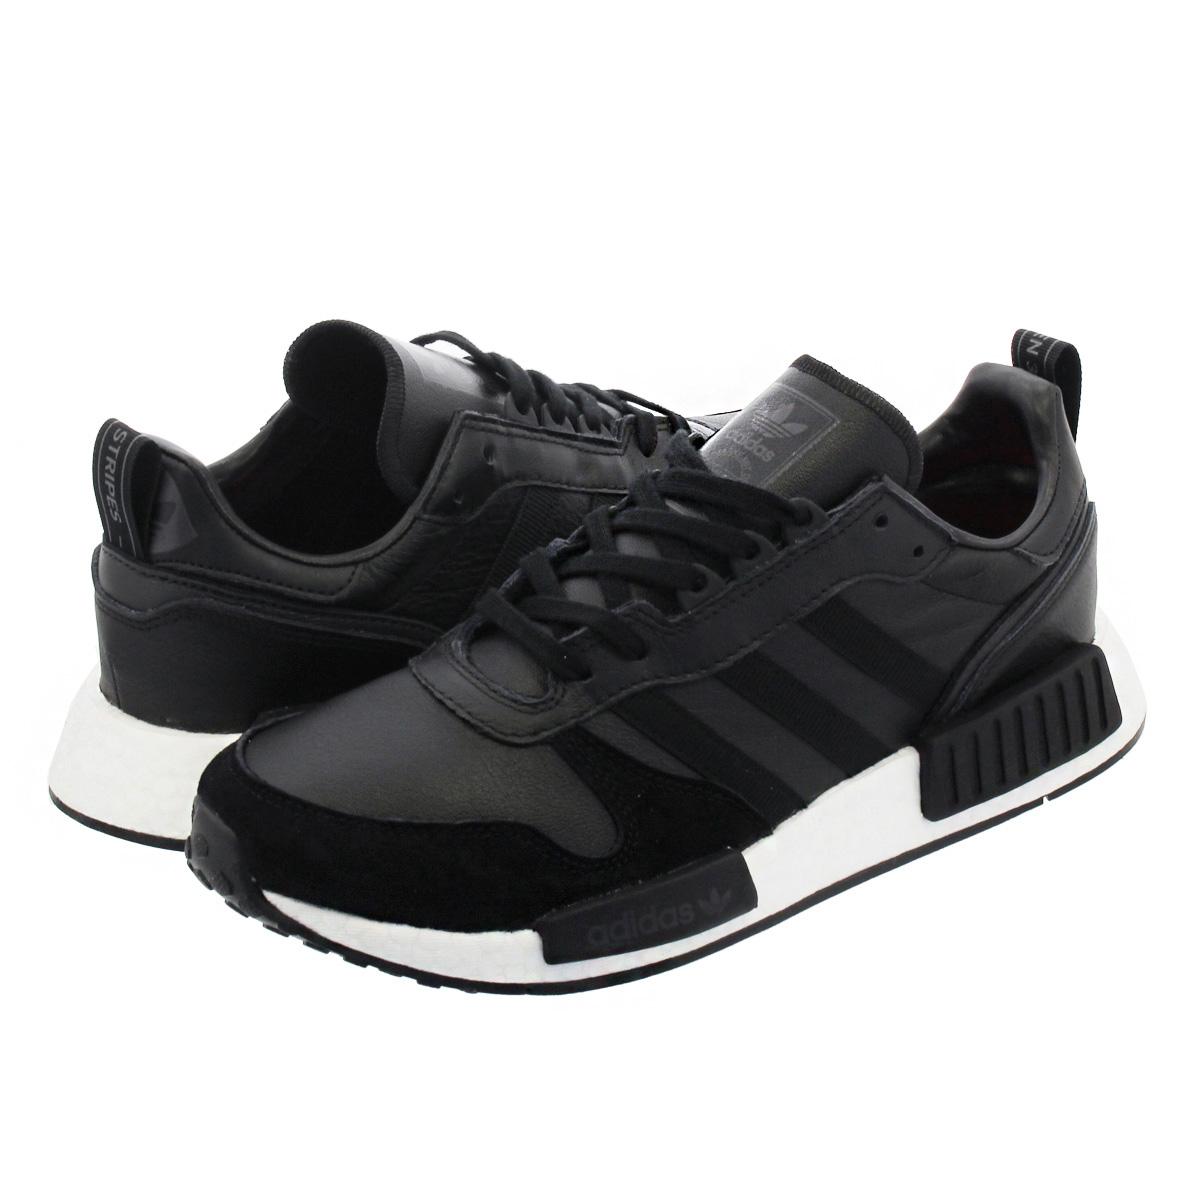 low cost 3dca0 ee434 adidas RISINGSTAR x R1 Adidas rising star x R1 CORE BLACK/UTILITY  BLACK/SOLAR RED ee3655